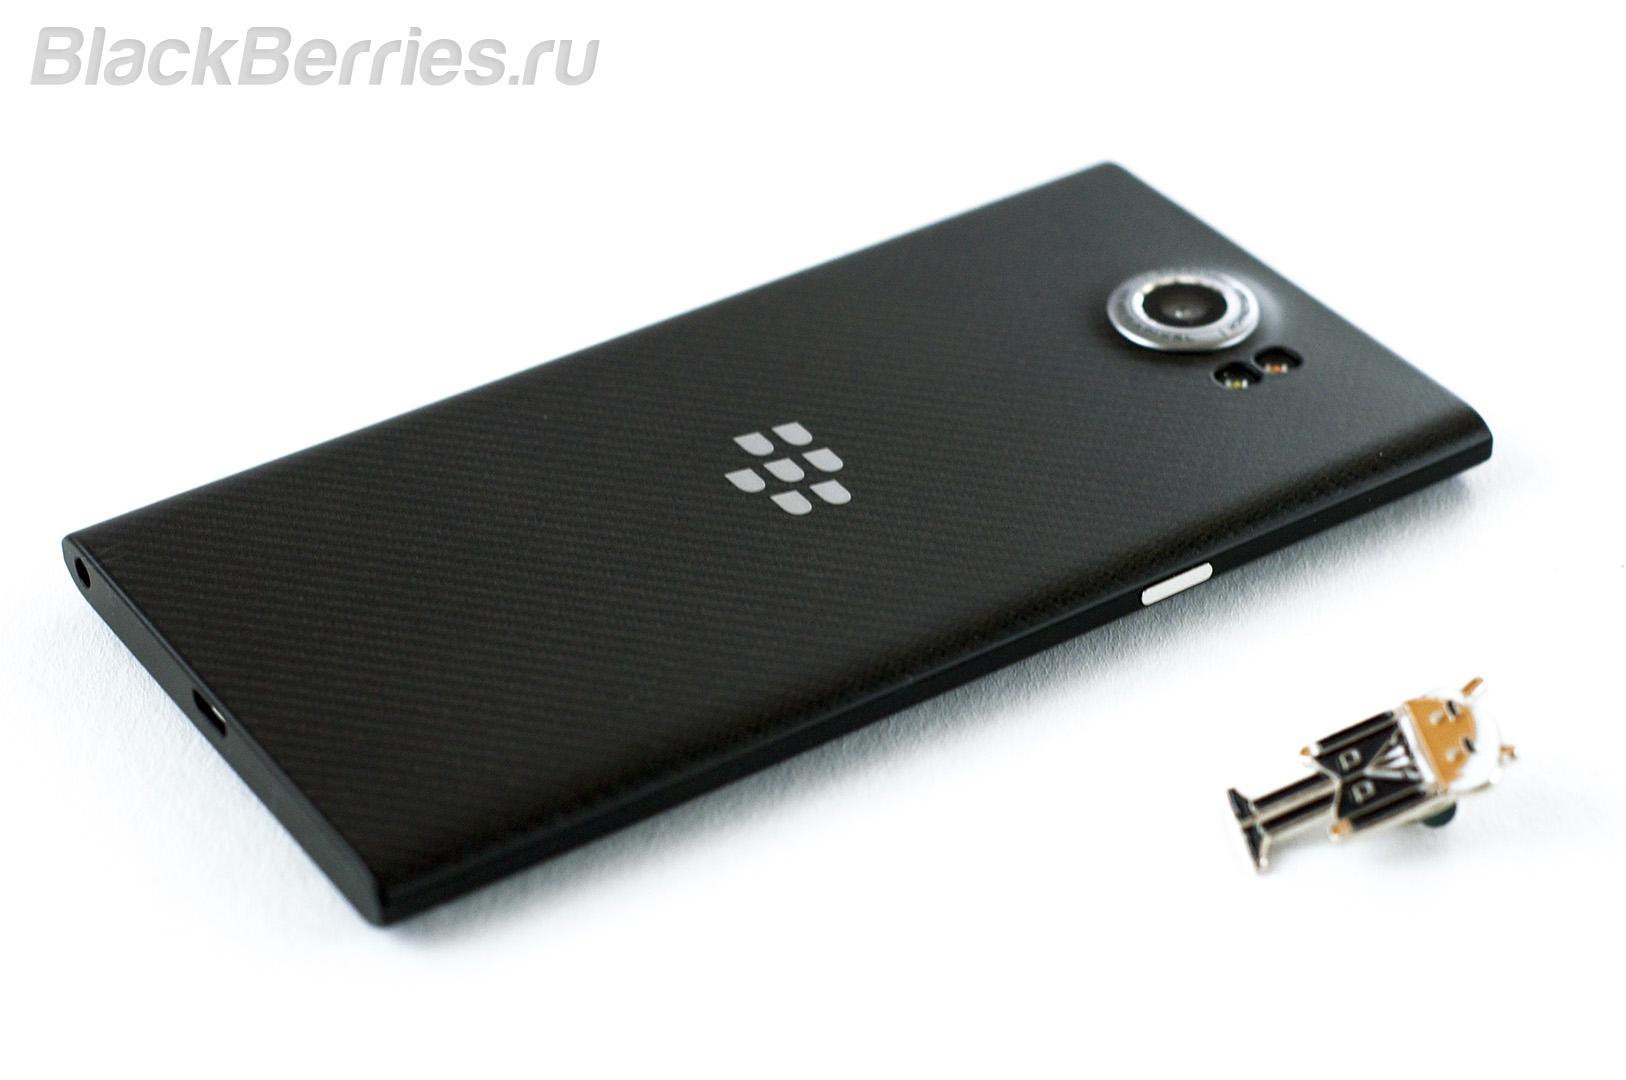 BlackBerry-Priv-Review-130